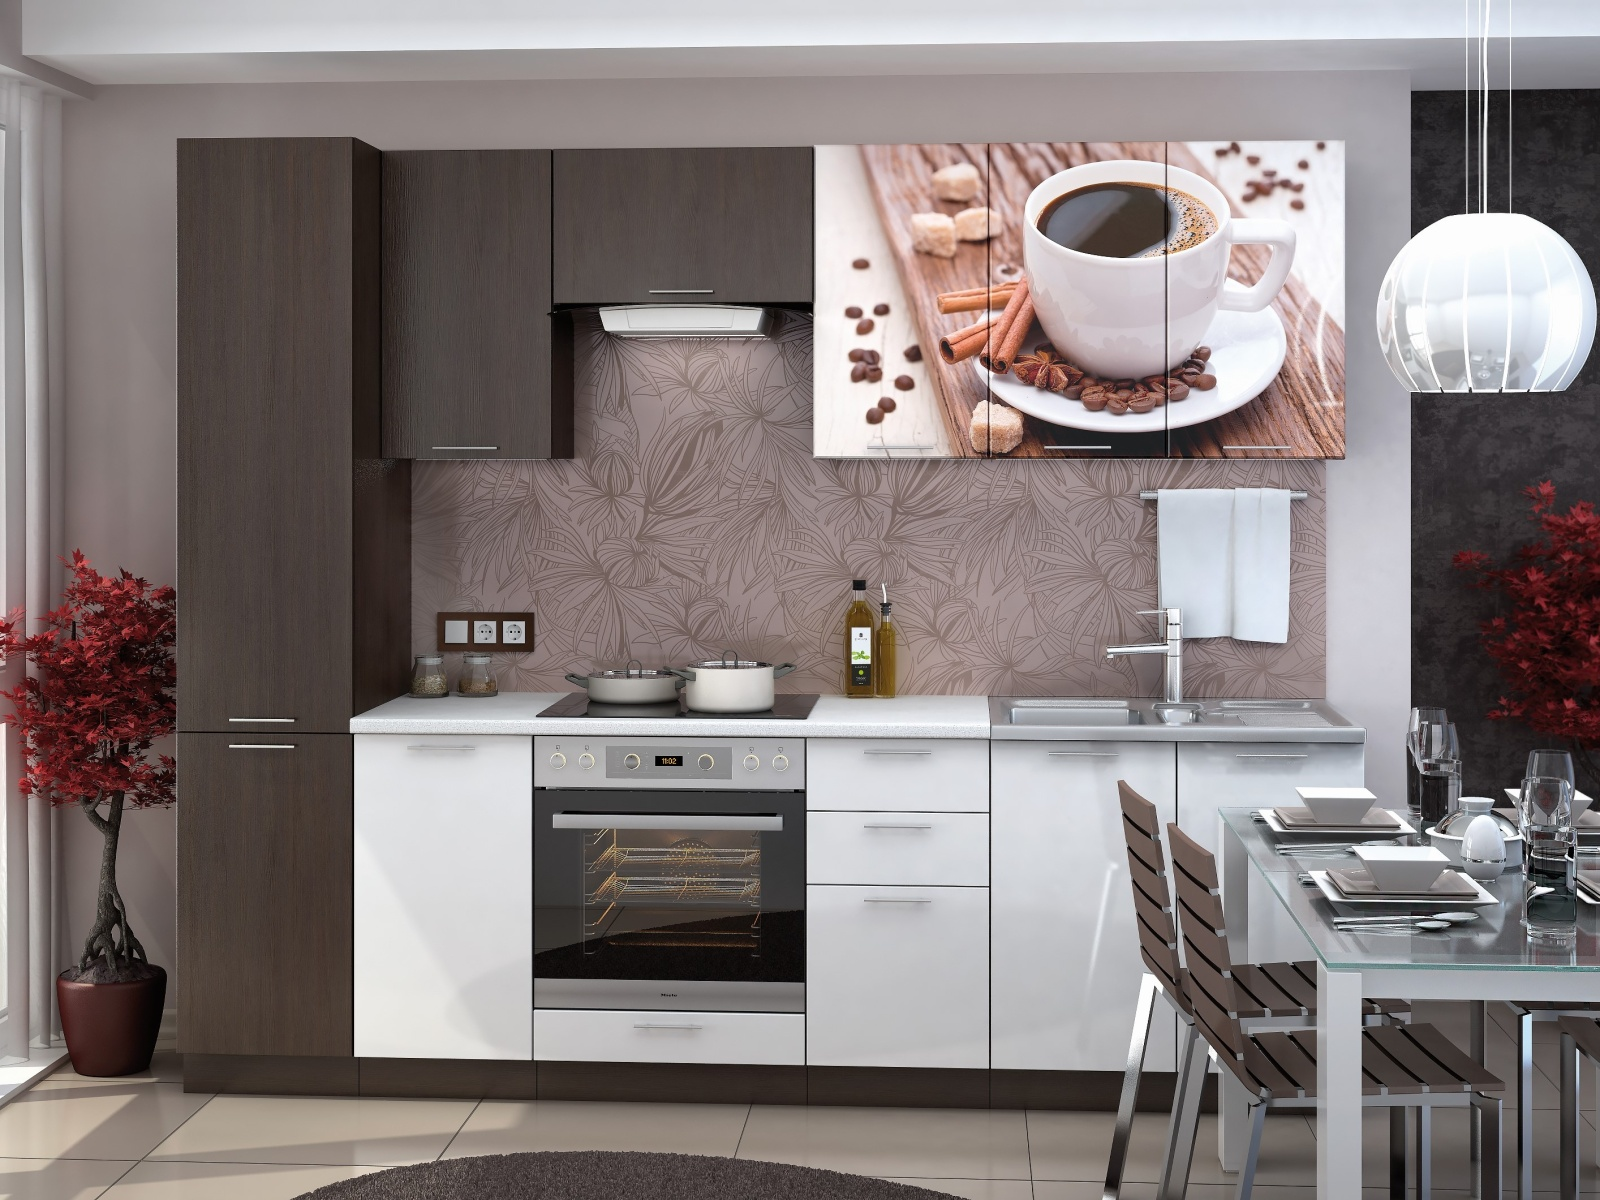 Smartshop Kuchyně ART 220 cm, coffee